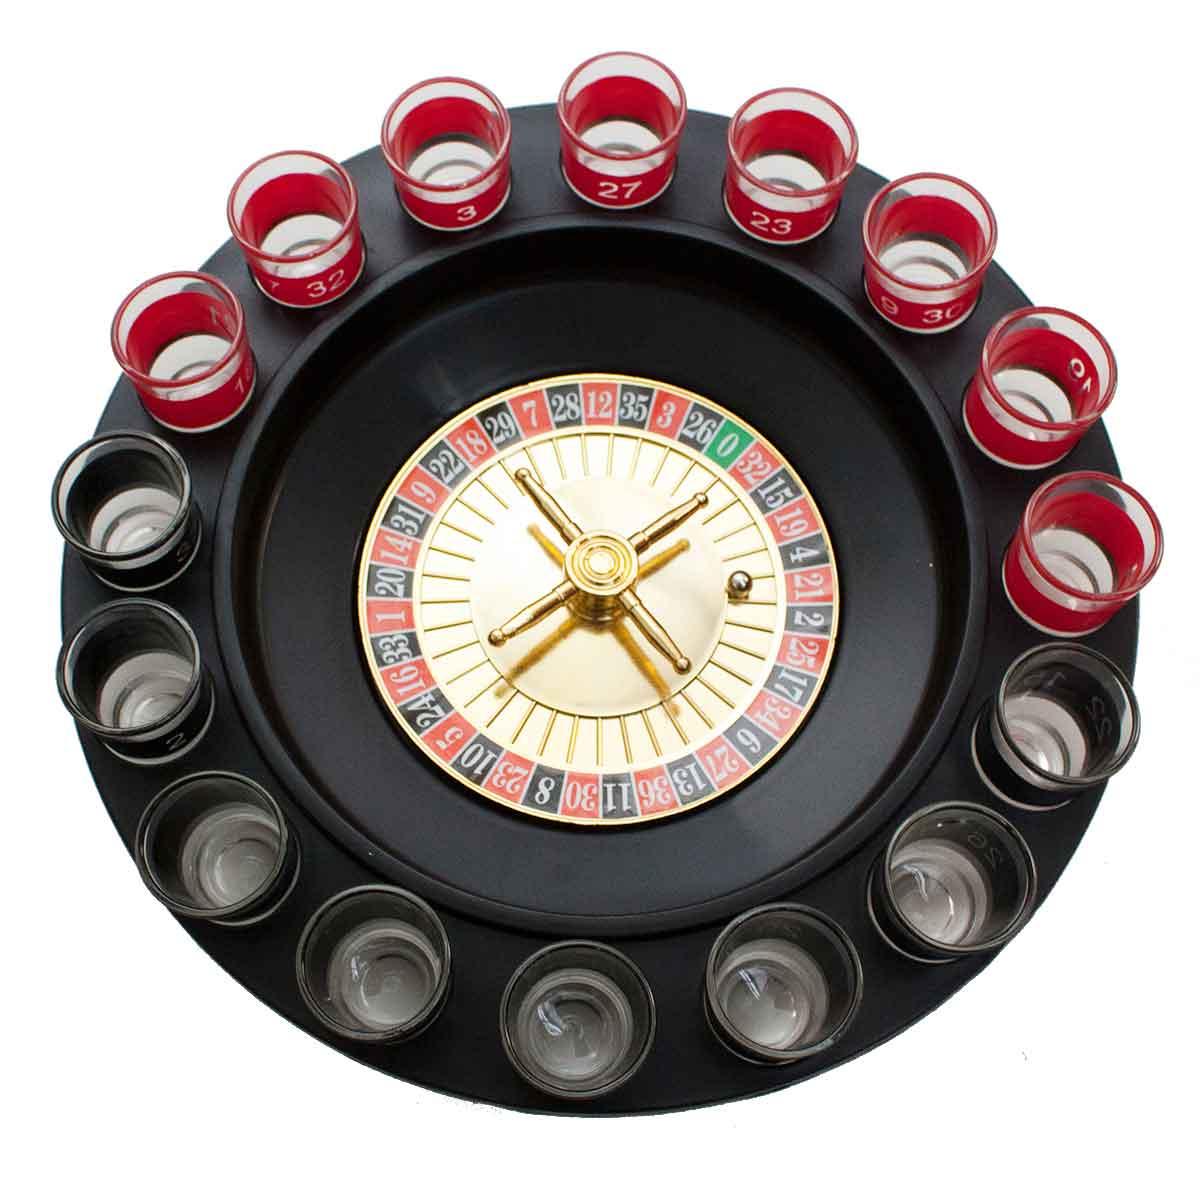 Jogo P/ Beber Cassino Roleta Shot Drink Beer Bebida 16 Copos